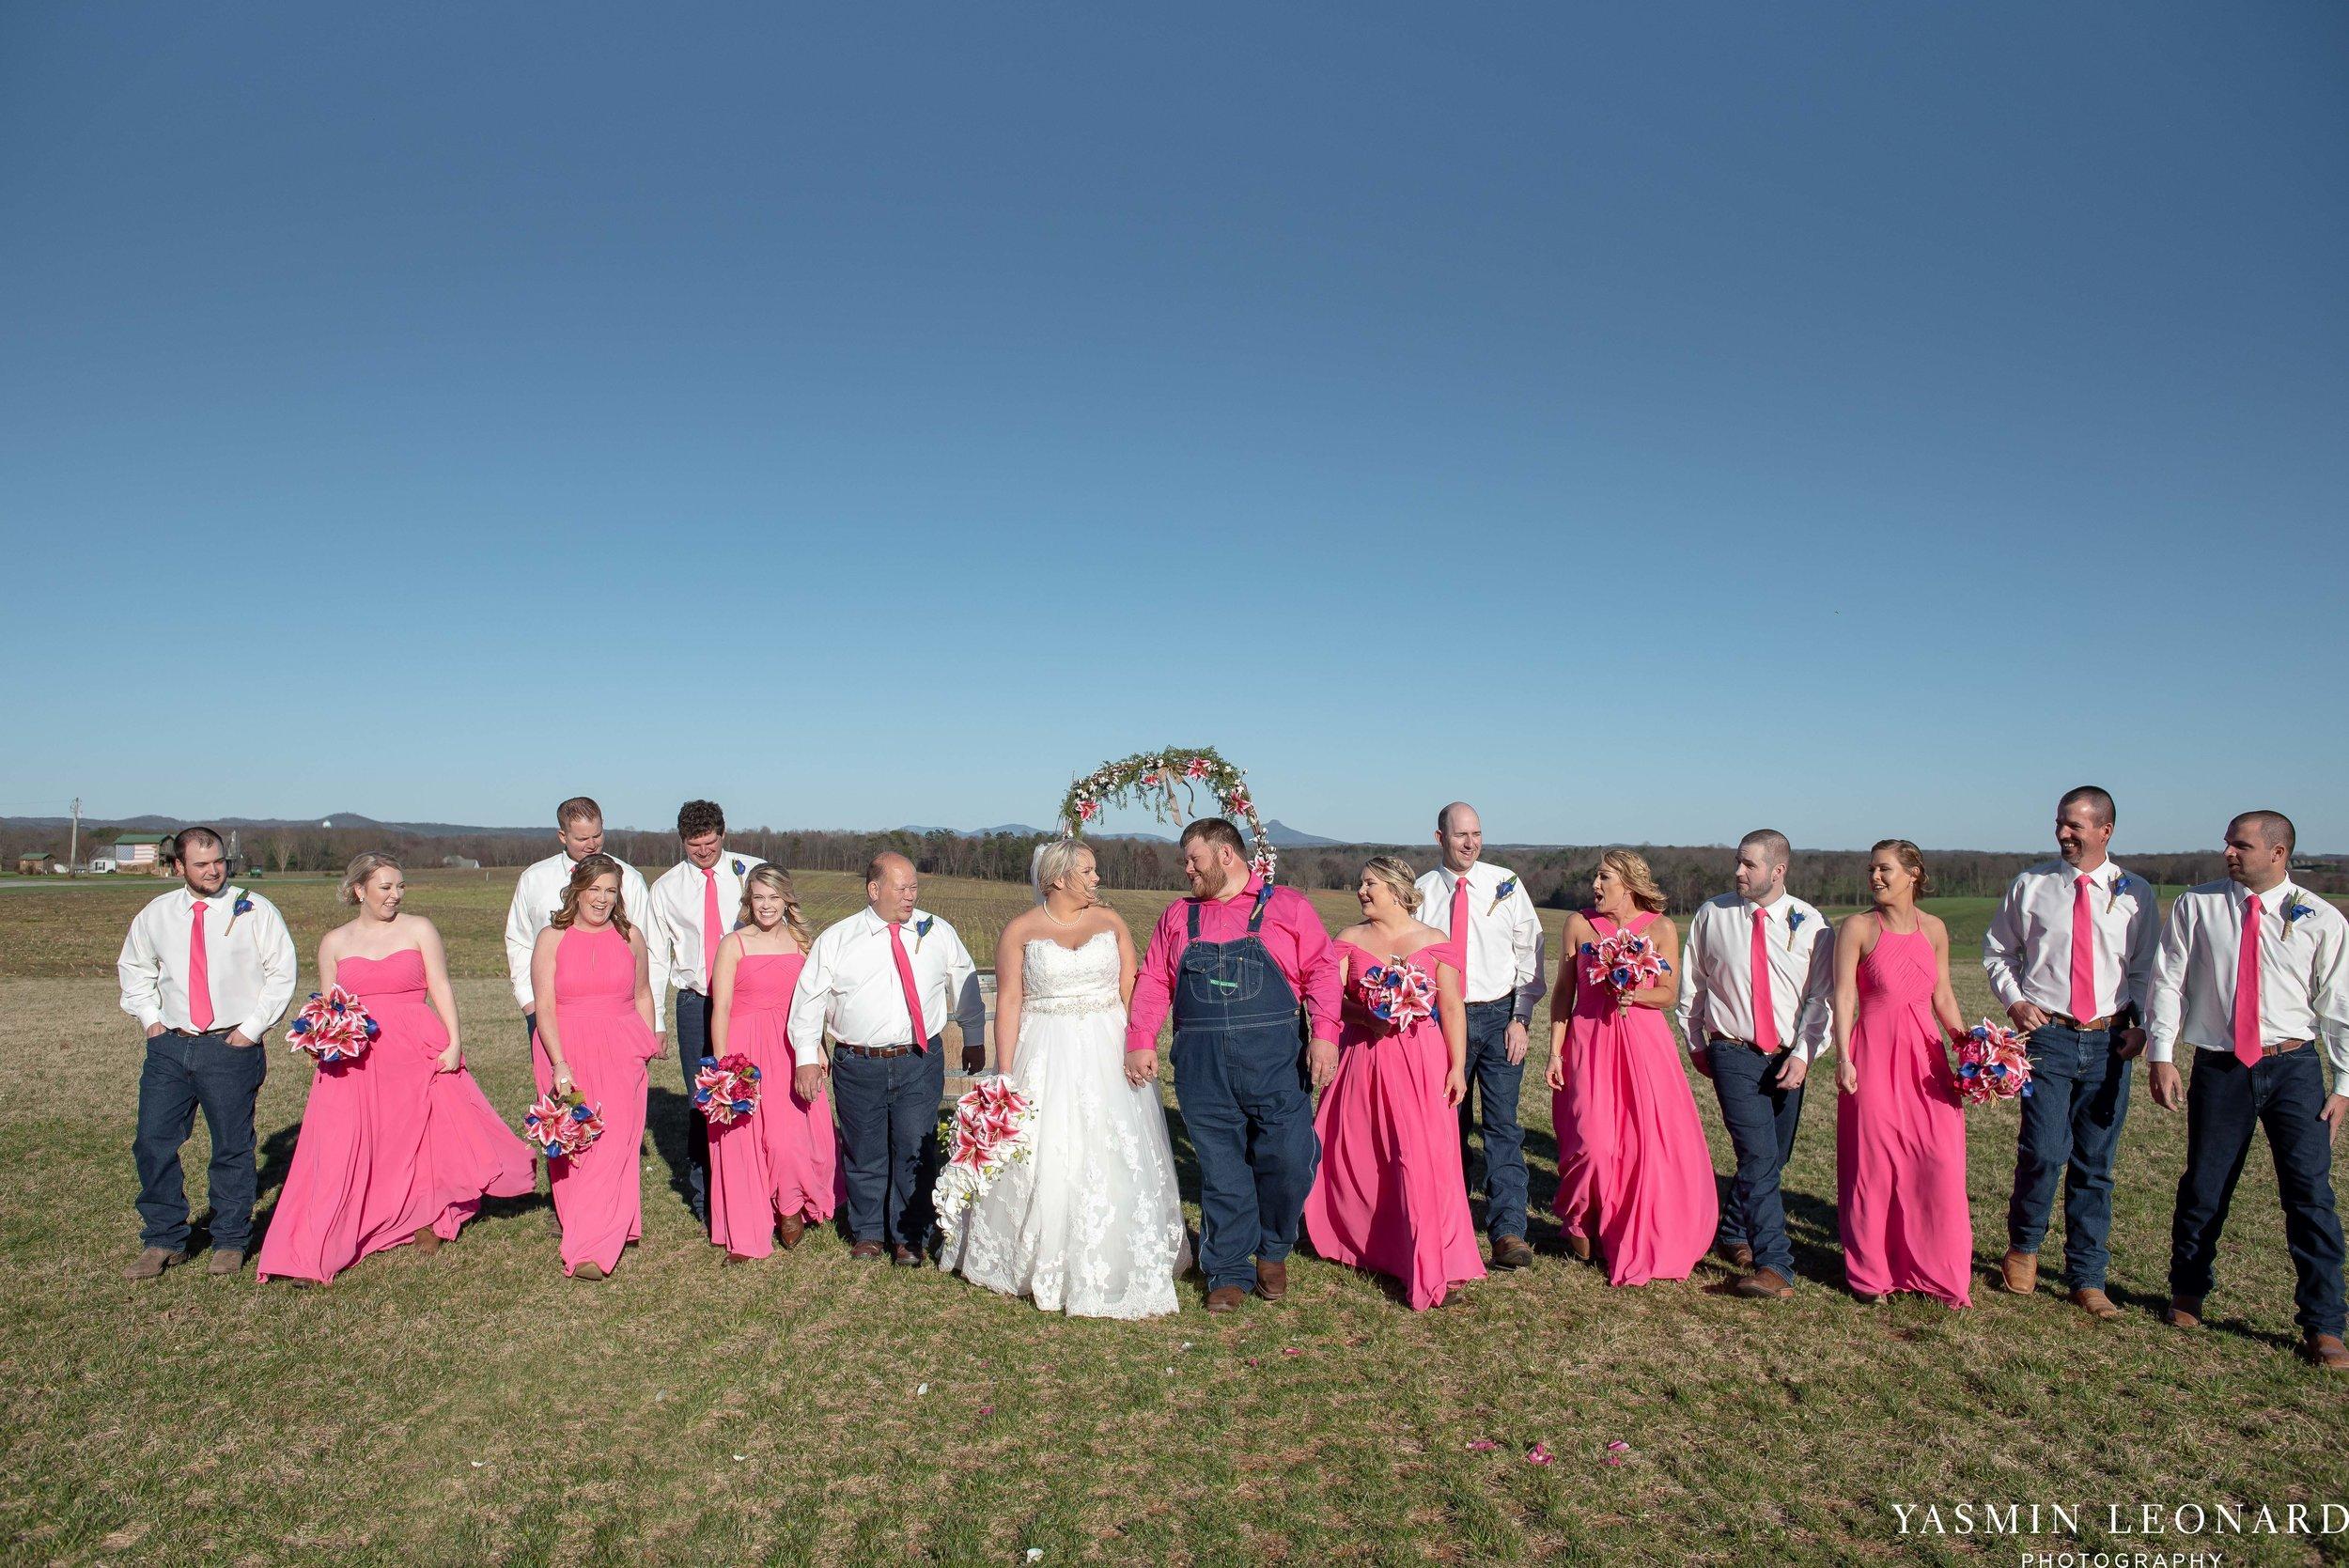 The Barn at Heritage Farm - Country Wedding - Pink and Blue Wedding - Barn Wedding - Outdoor Wedding - Cotton and Wheat Decor - Groom in Bibs - Pink Bridal Colors - Yasmin Leonard Photography-18.jpg